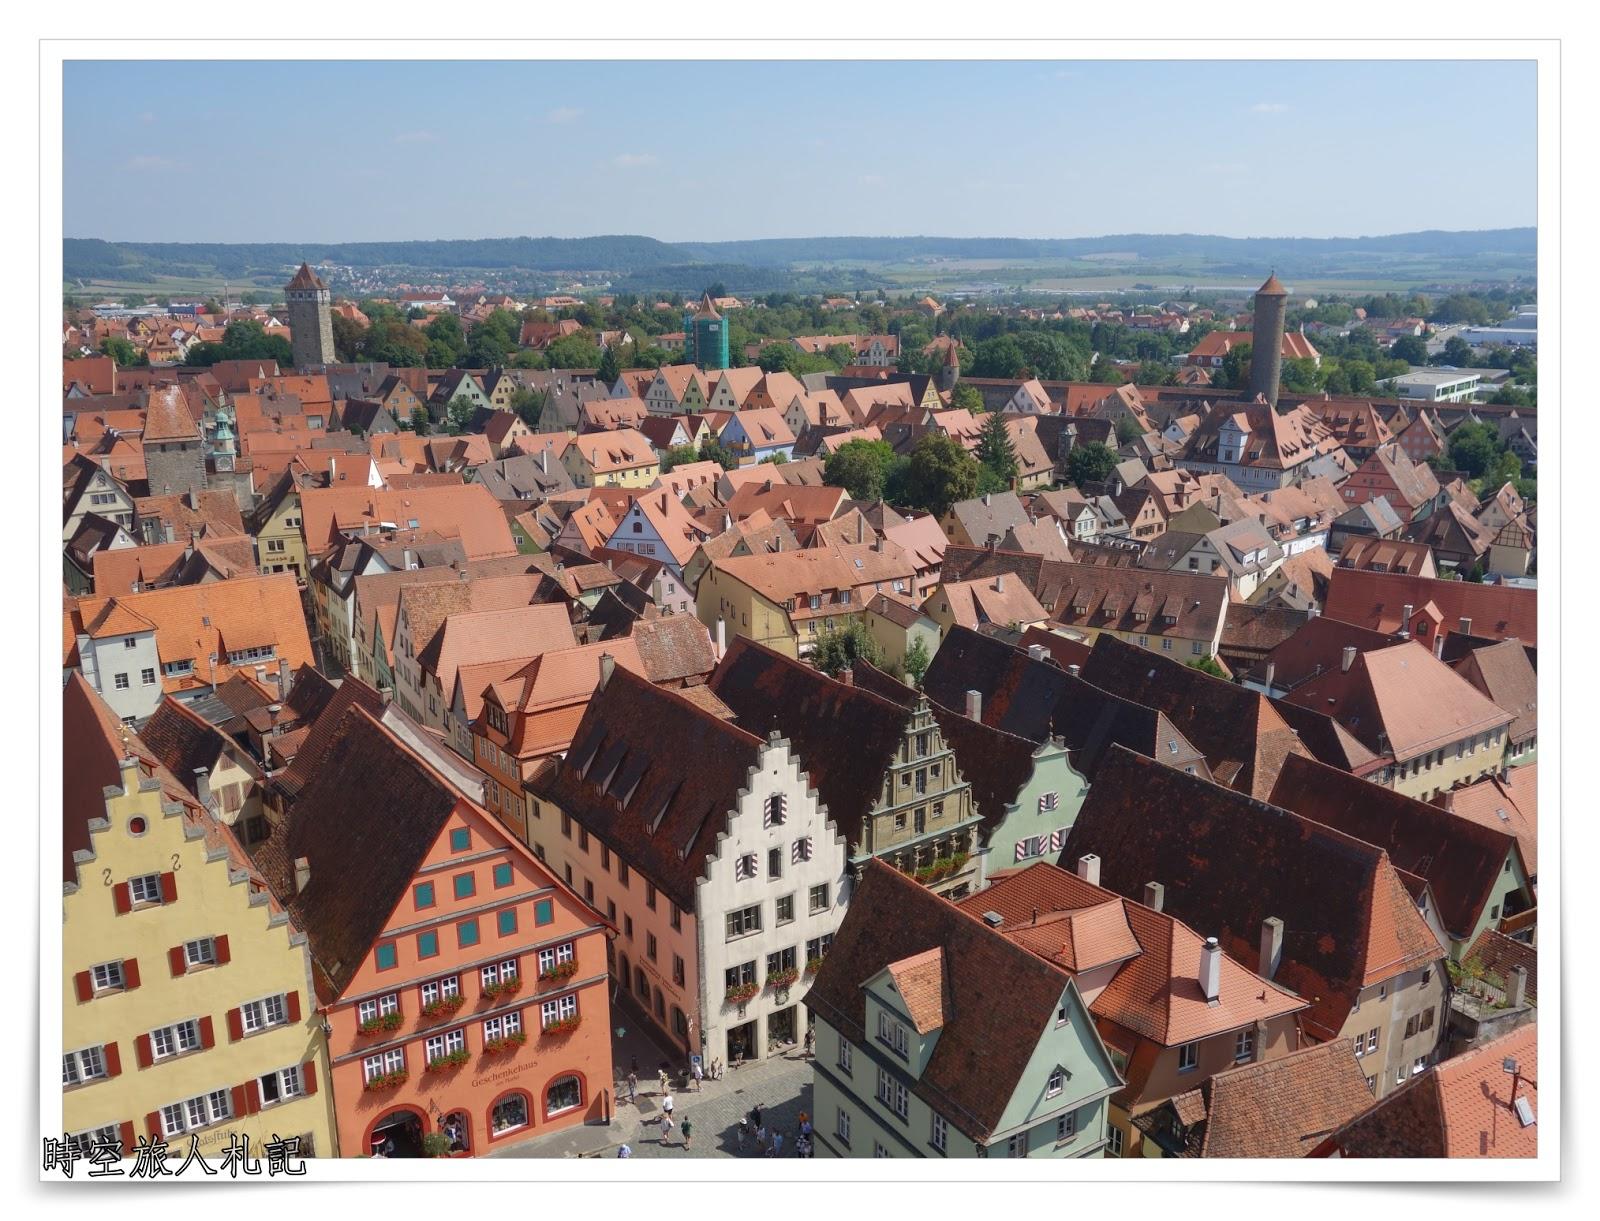 羅騰堡 Rothenburg ob der Tauber : 被凍齡的中世紀德國古城